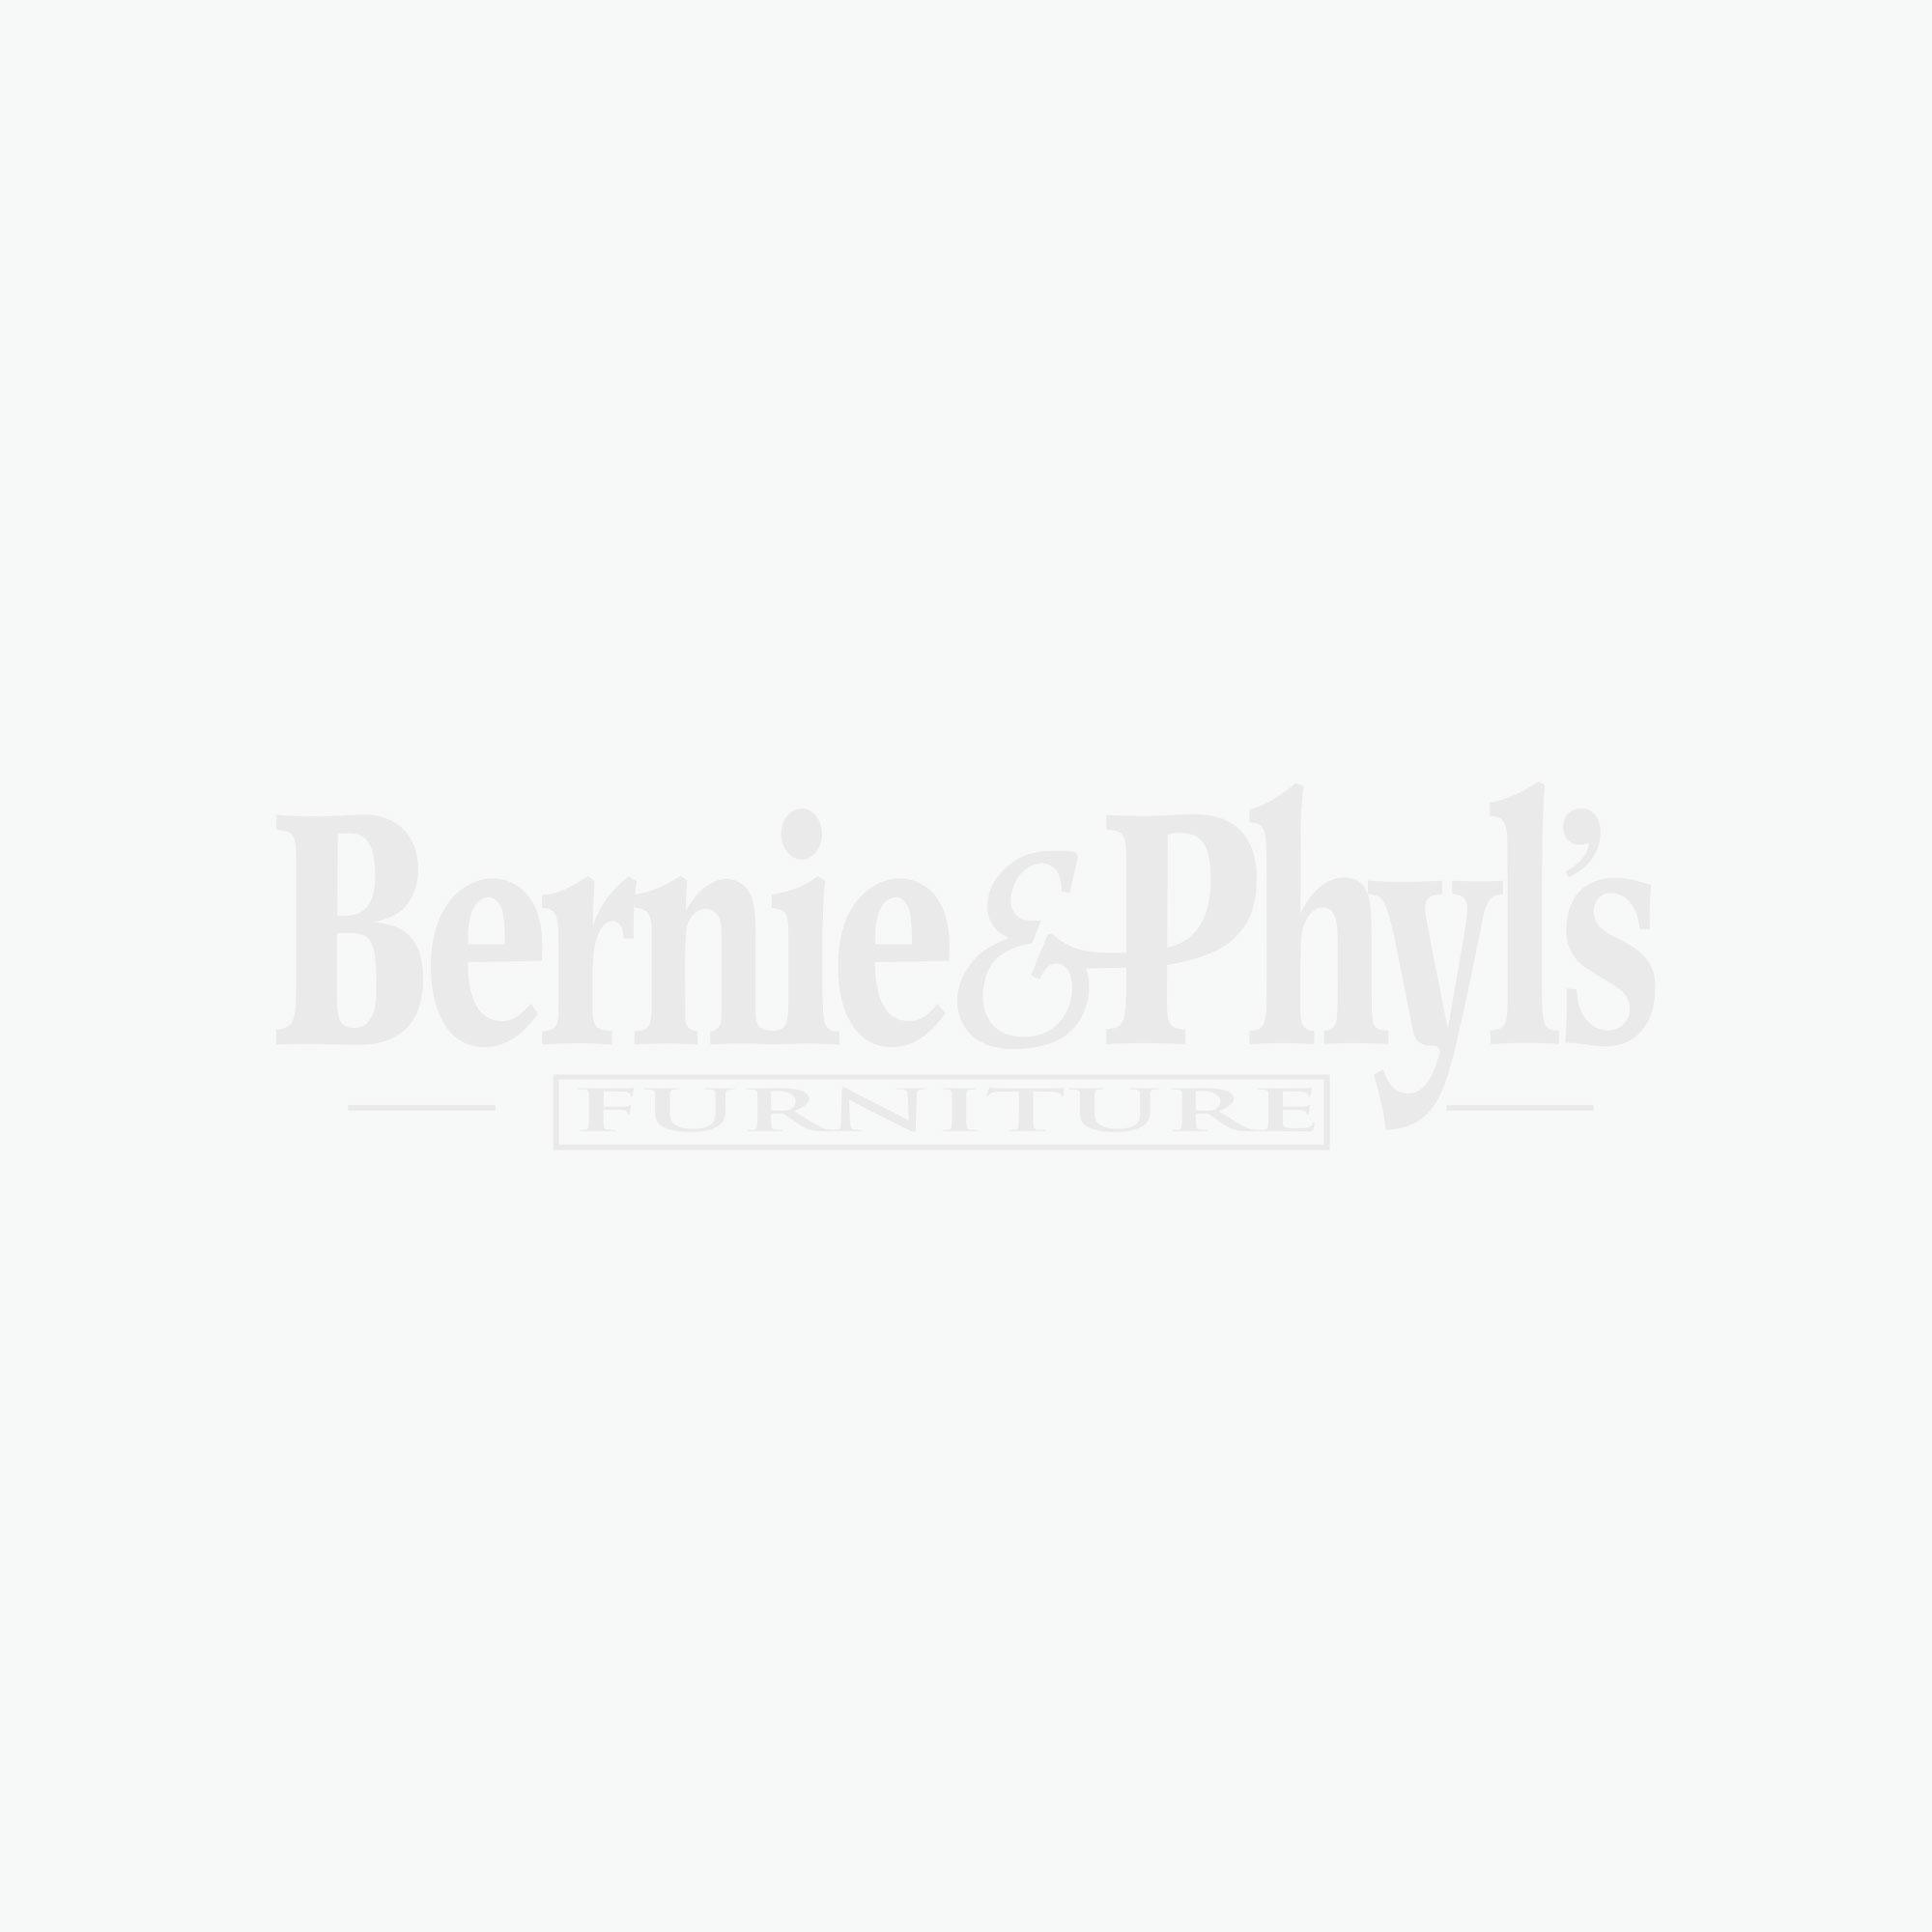 Burkner Marine Power Reclining Sofa Bernie Phyl S Furniture By Ashley Furniture